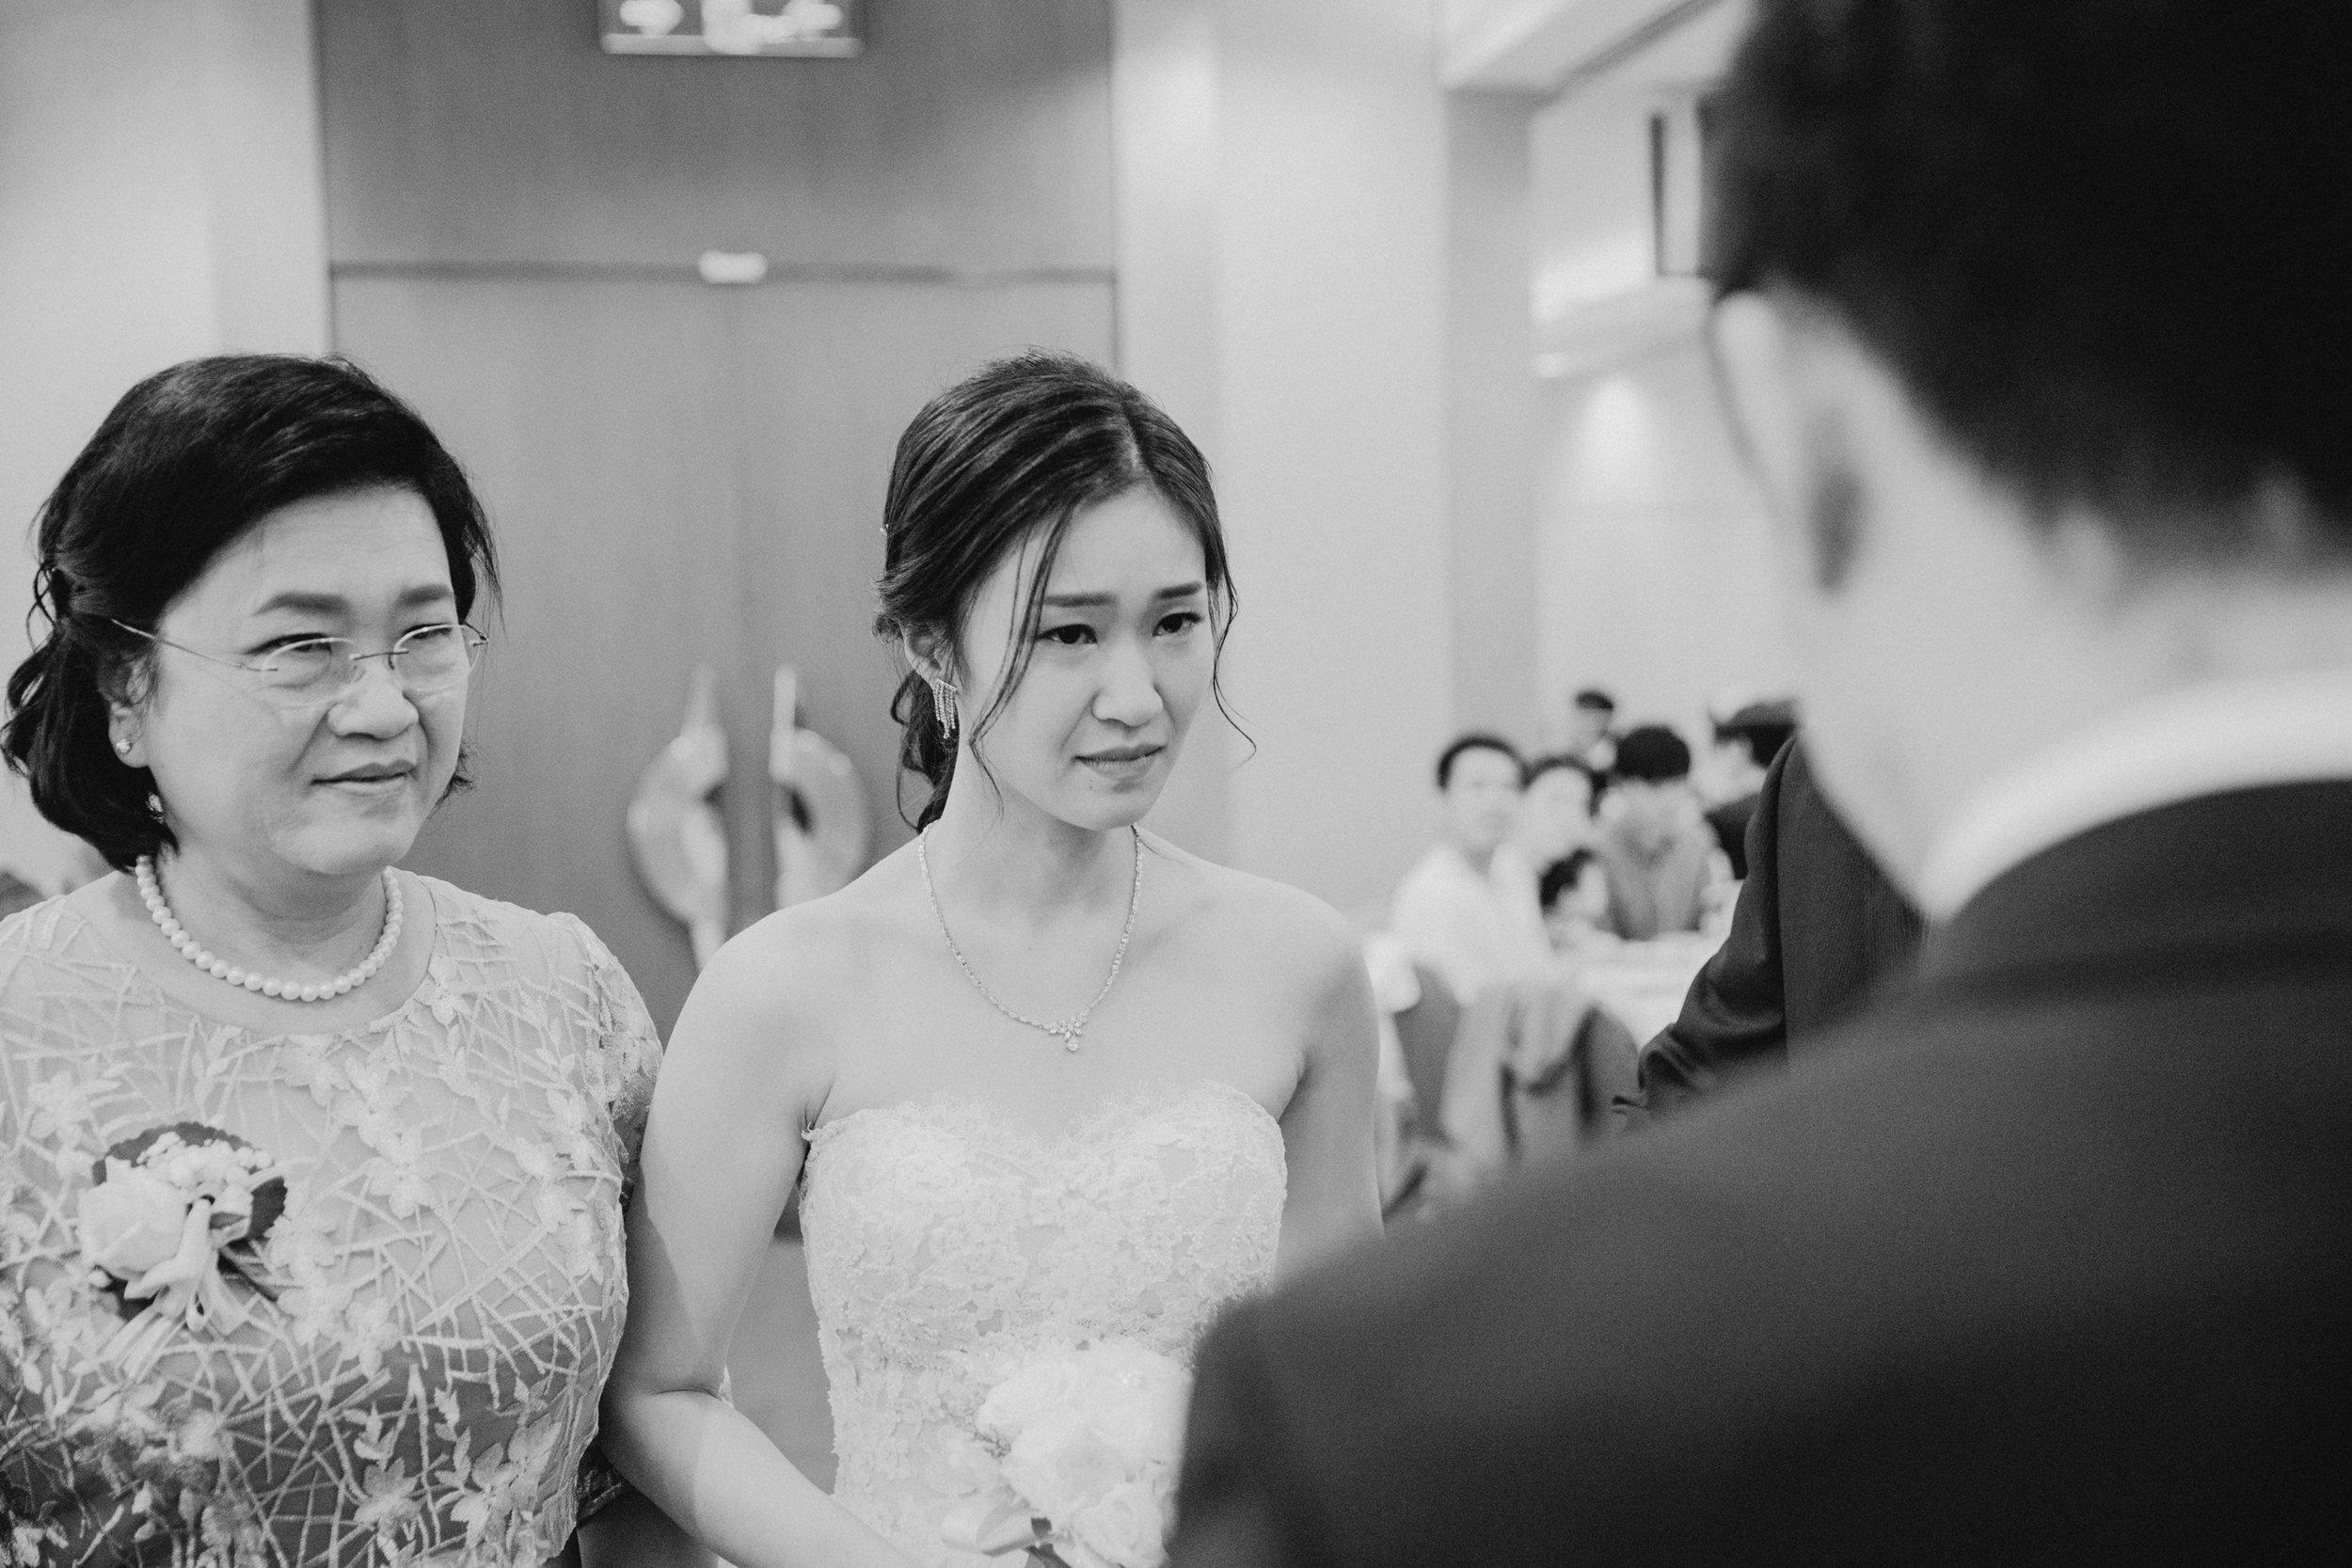 wedding-caridee-oscar-lunch-ambassador-hsinchu-結婚午宴-新竹國賓_69.jpg